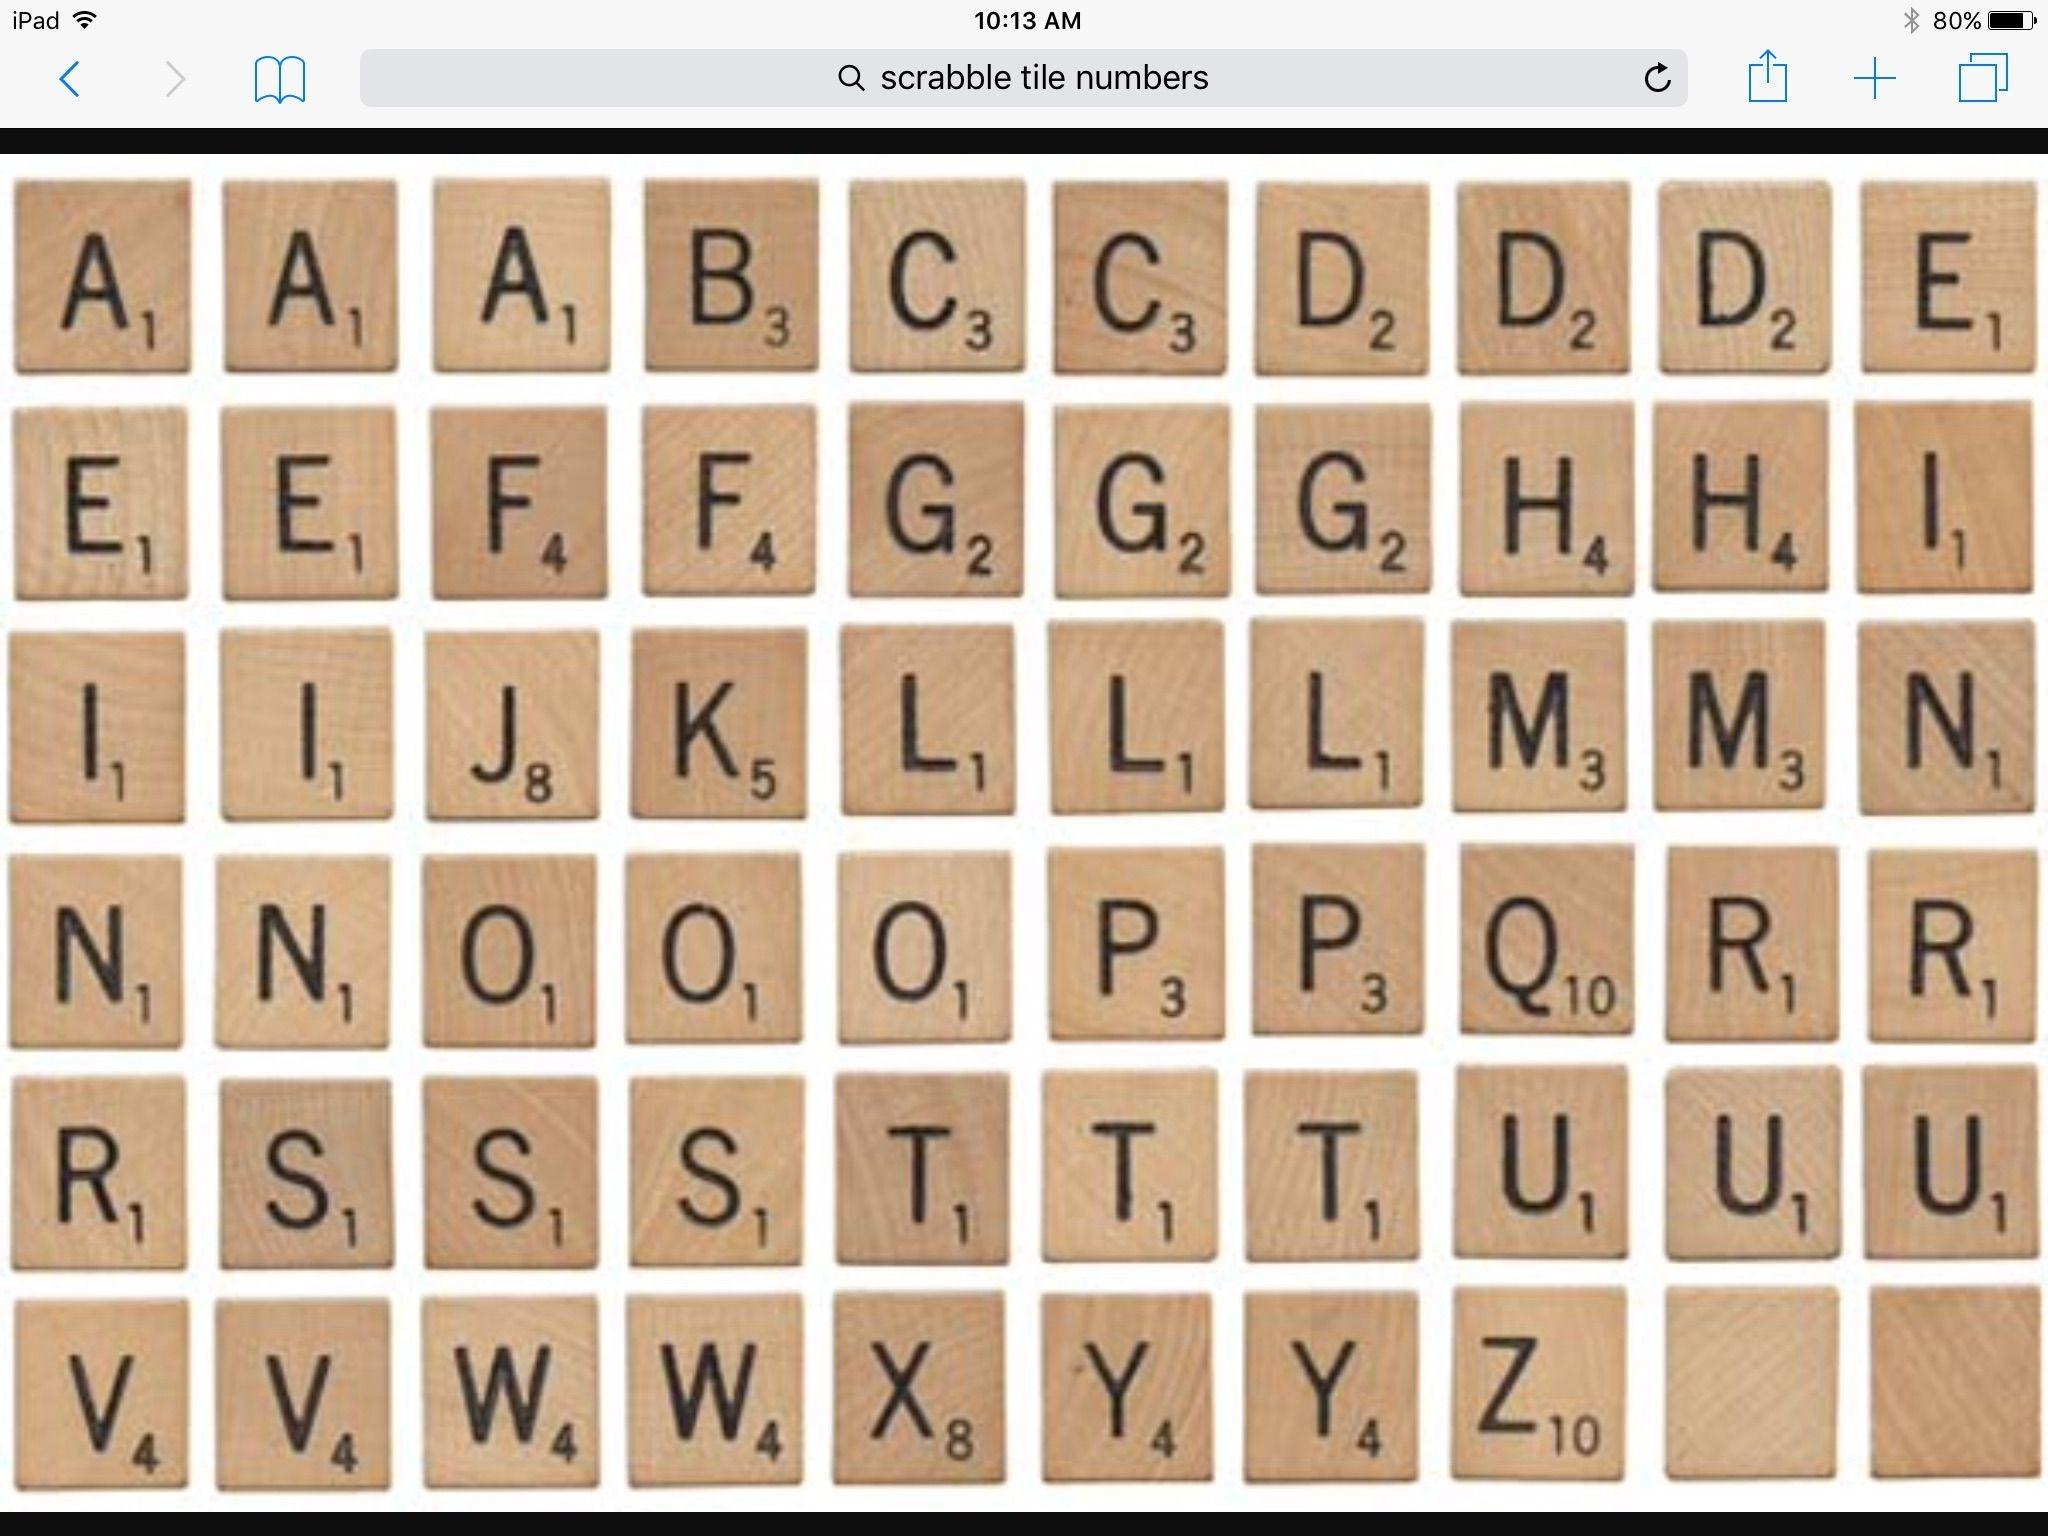 Pinkathee Wheeler On Cards - Birthday | Giant Scrabble Tiles - Free Printable Scrabble Tiles